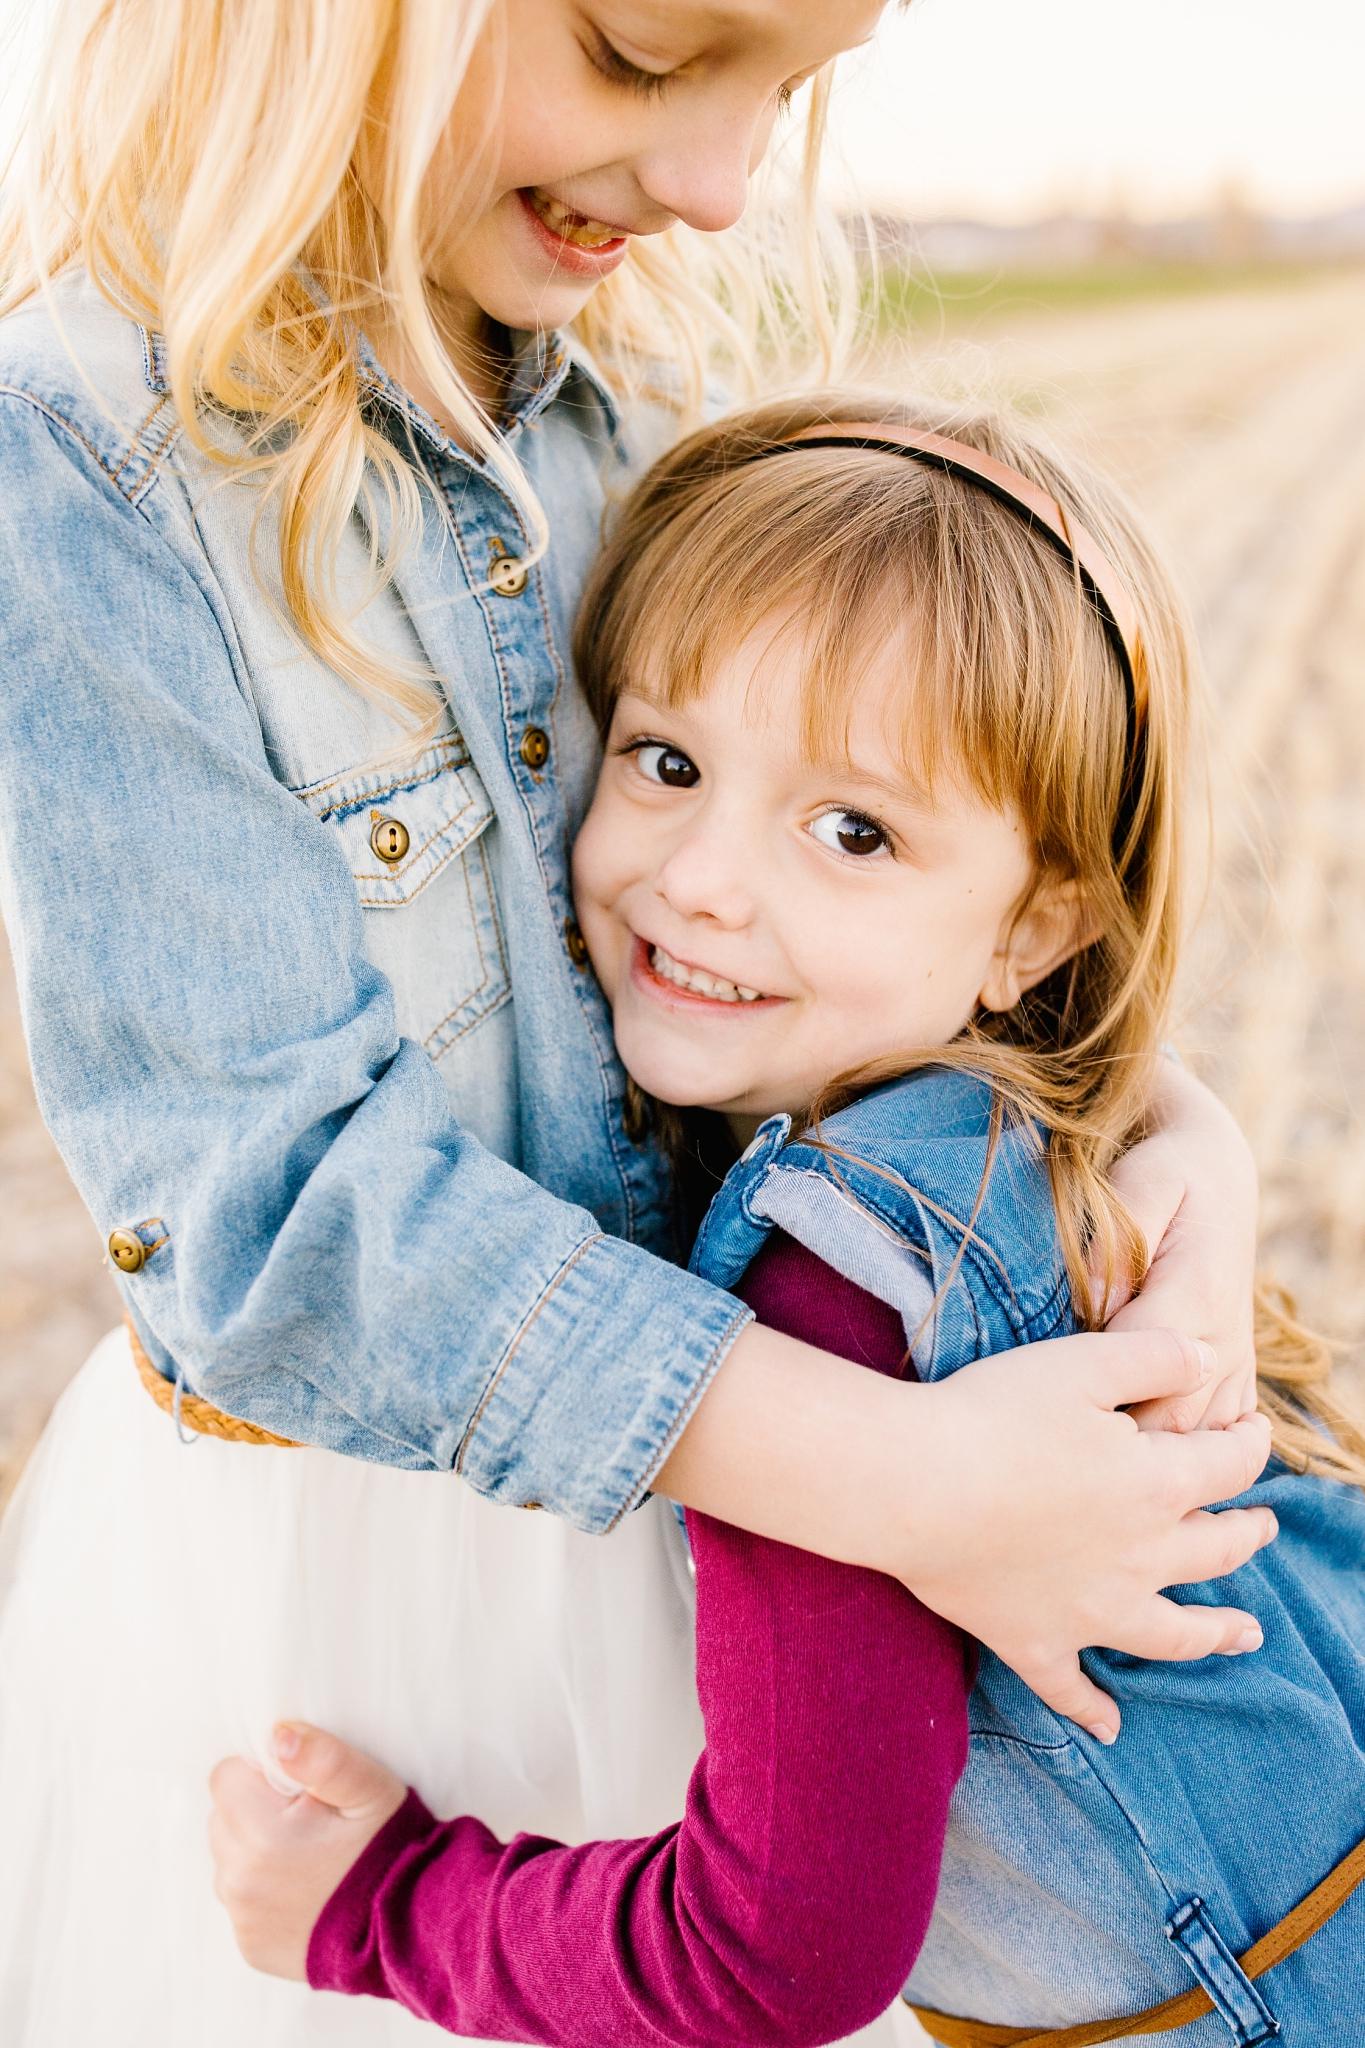 Mickelsen-85_Lizzie-B-Imagery-Utah-Family-Photographer-Lifestyle-Photography-Salt-Lake-City-Park-City-Utah-County.jpg